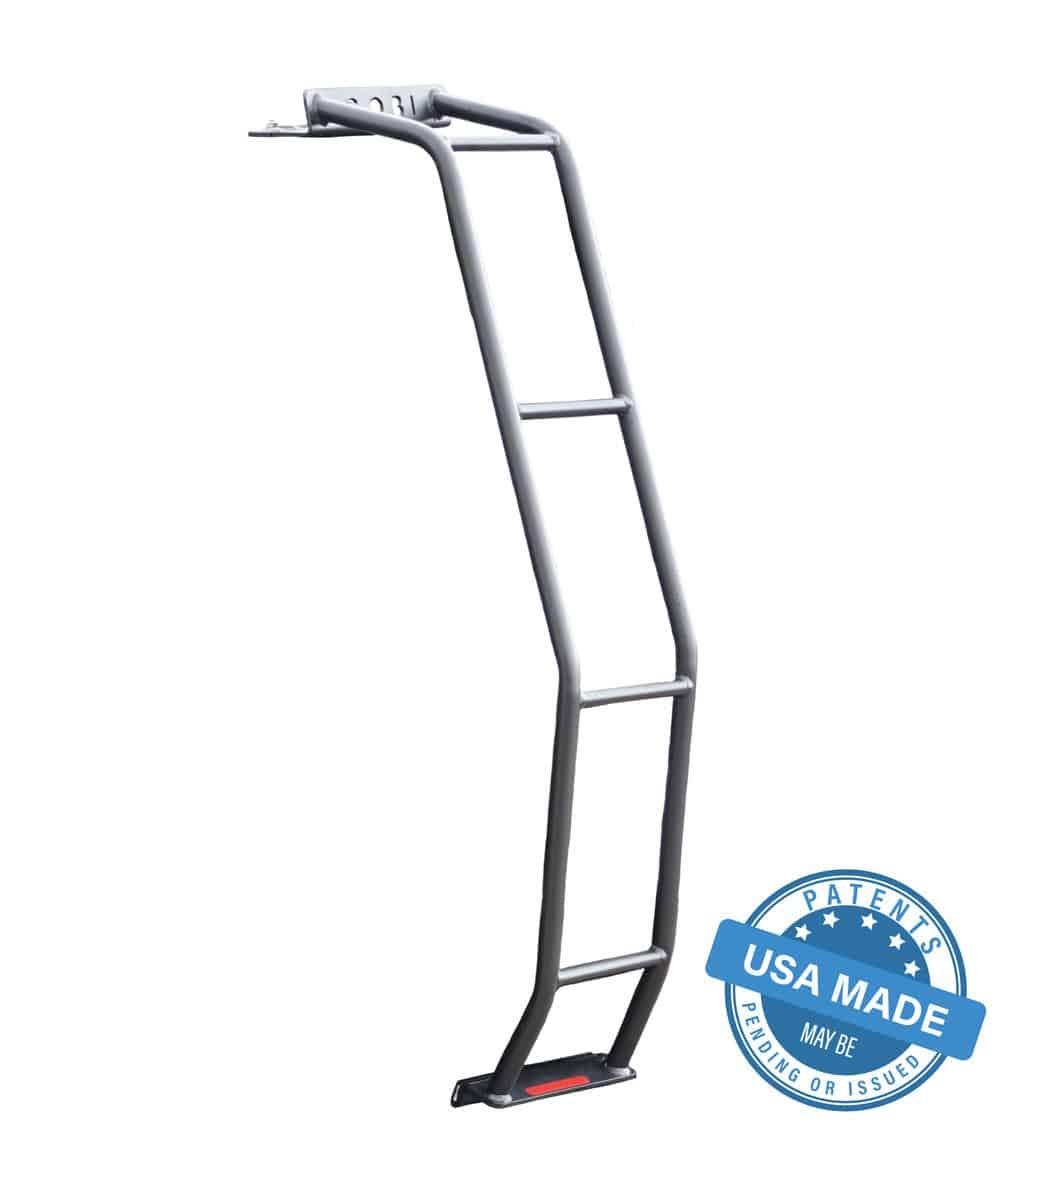 2019 Toyota Sequoia Towing Capacity Specs: GOBI Toyota 4Runner TRD Pro (2019) Rear Ladder